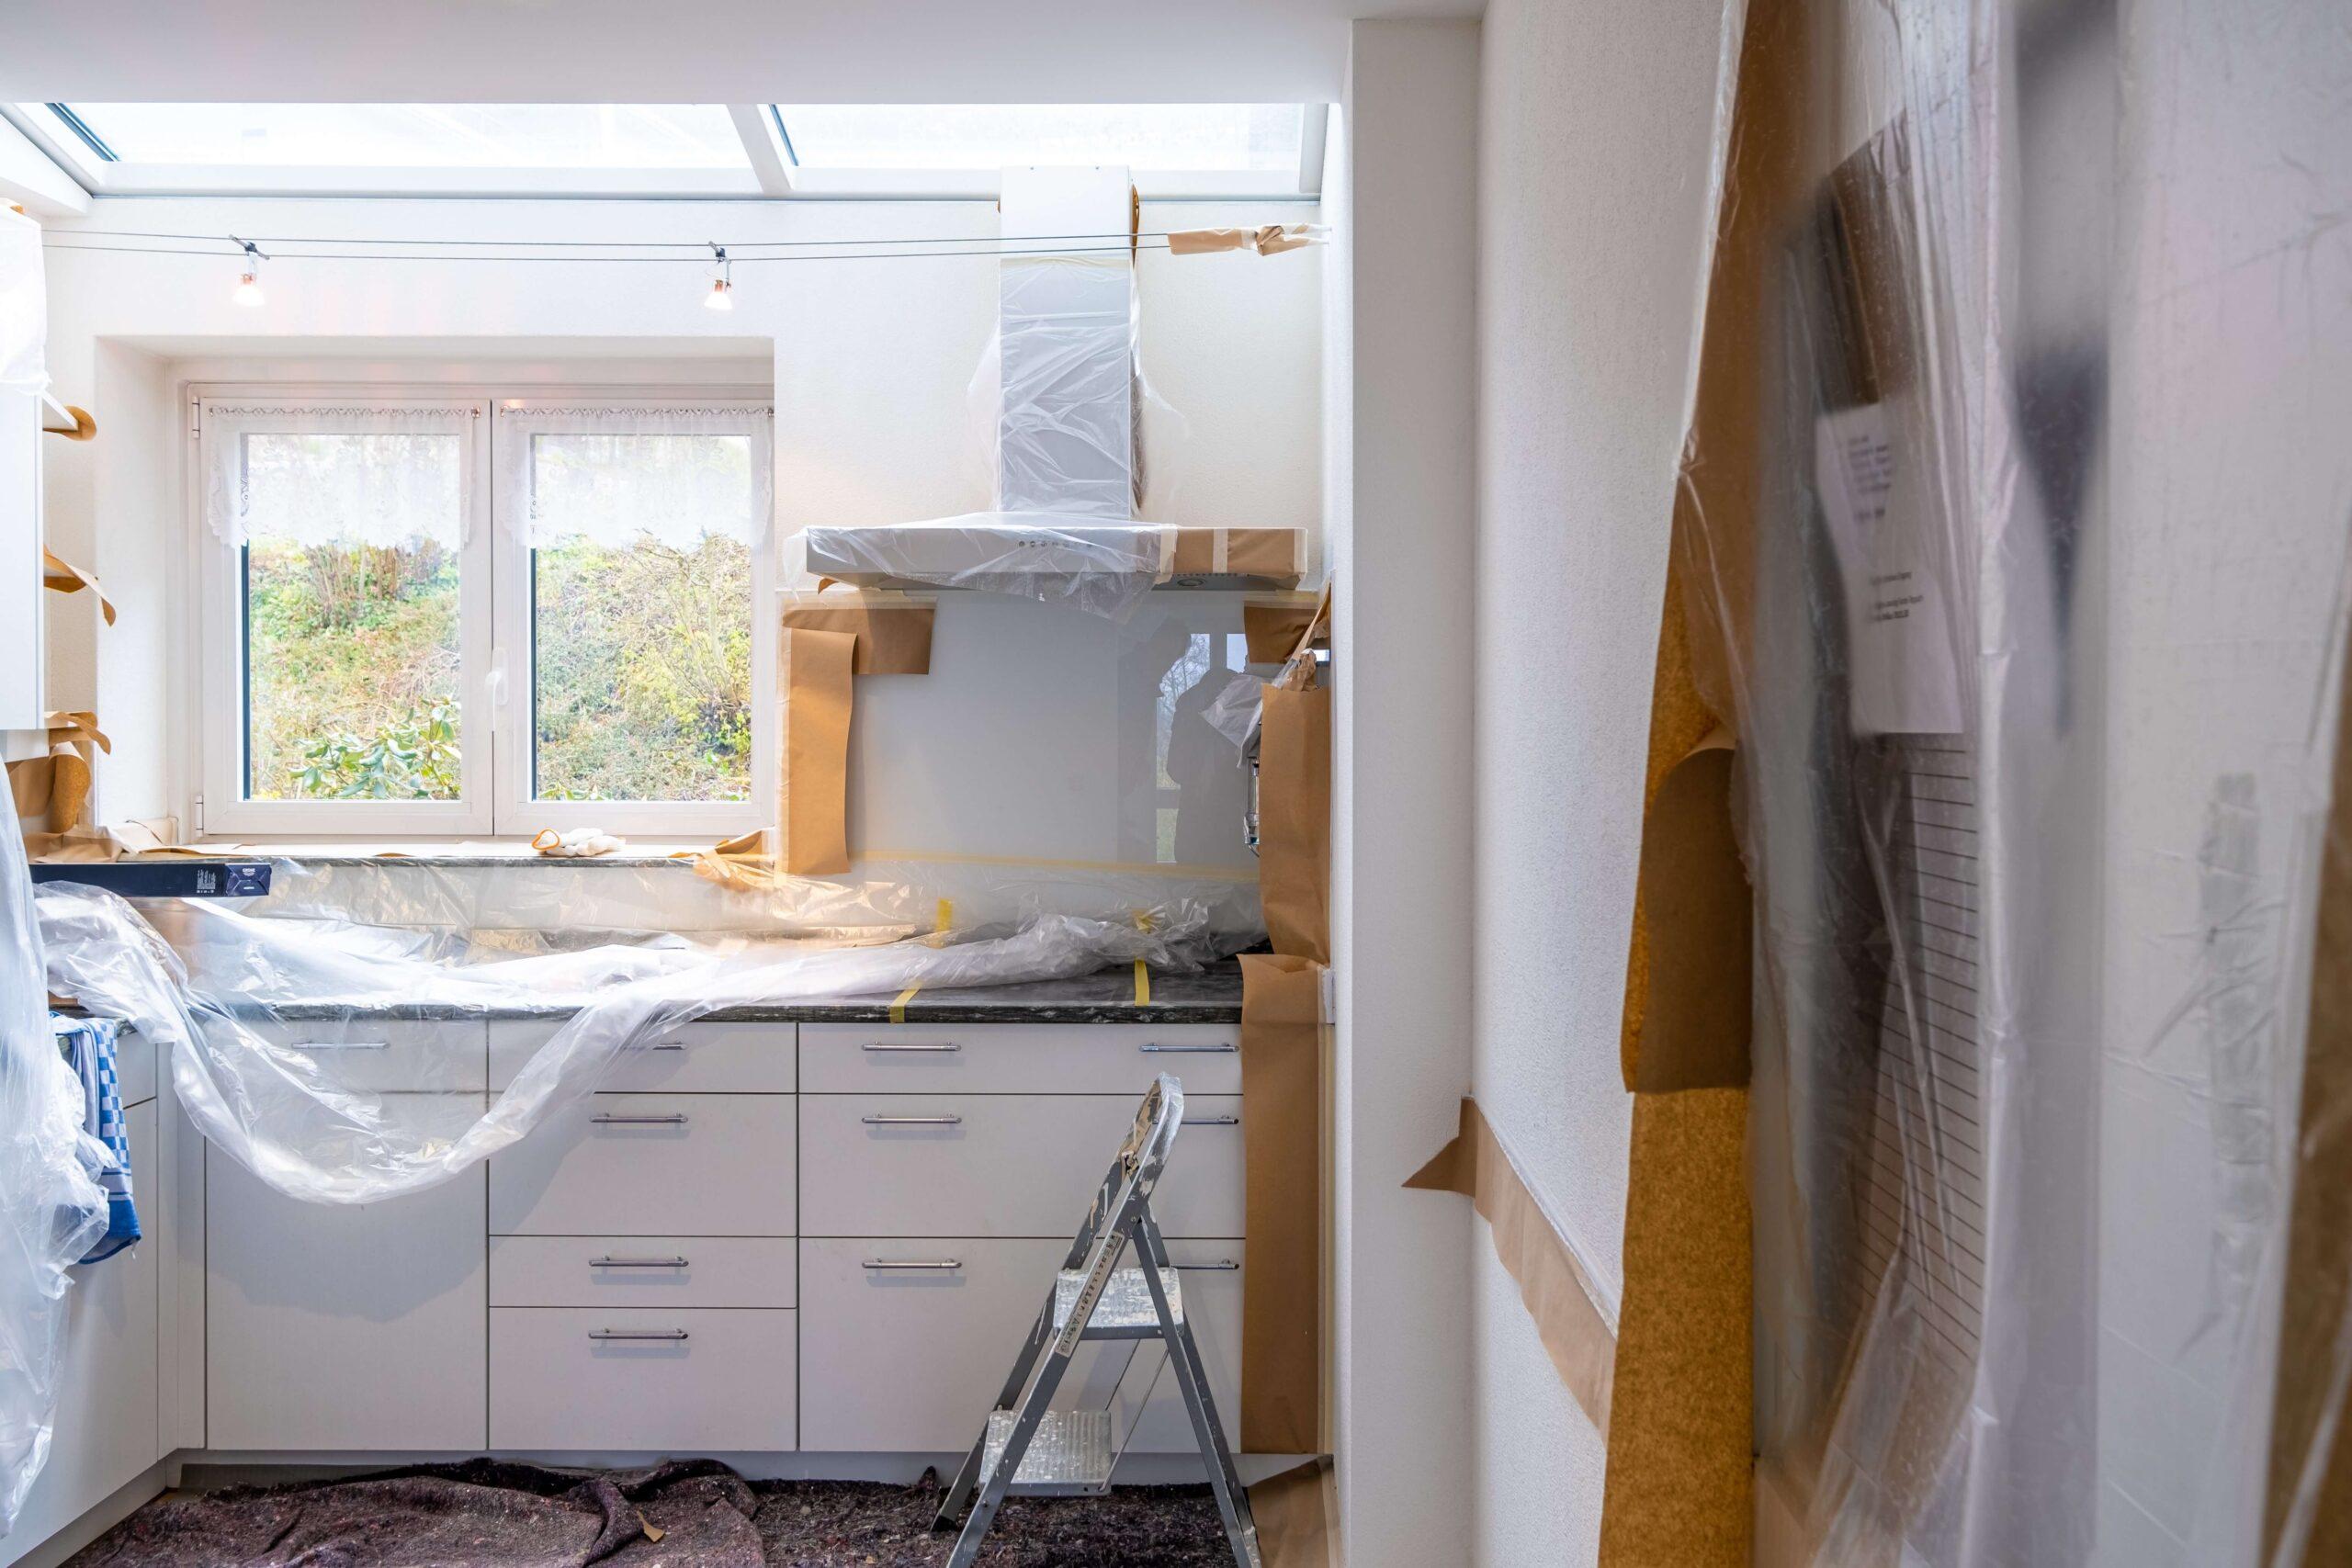 Hausbau: So fühlt sich die ganze Familie wohl